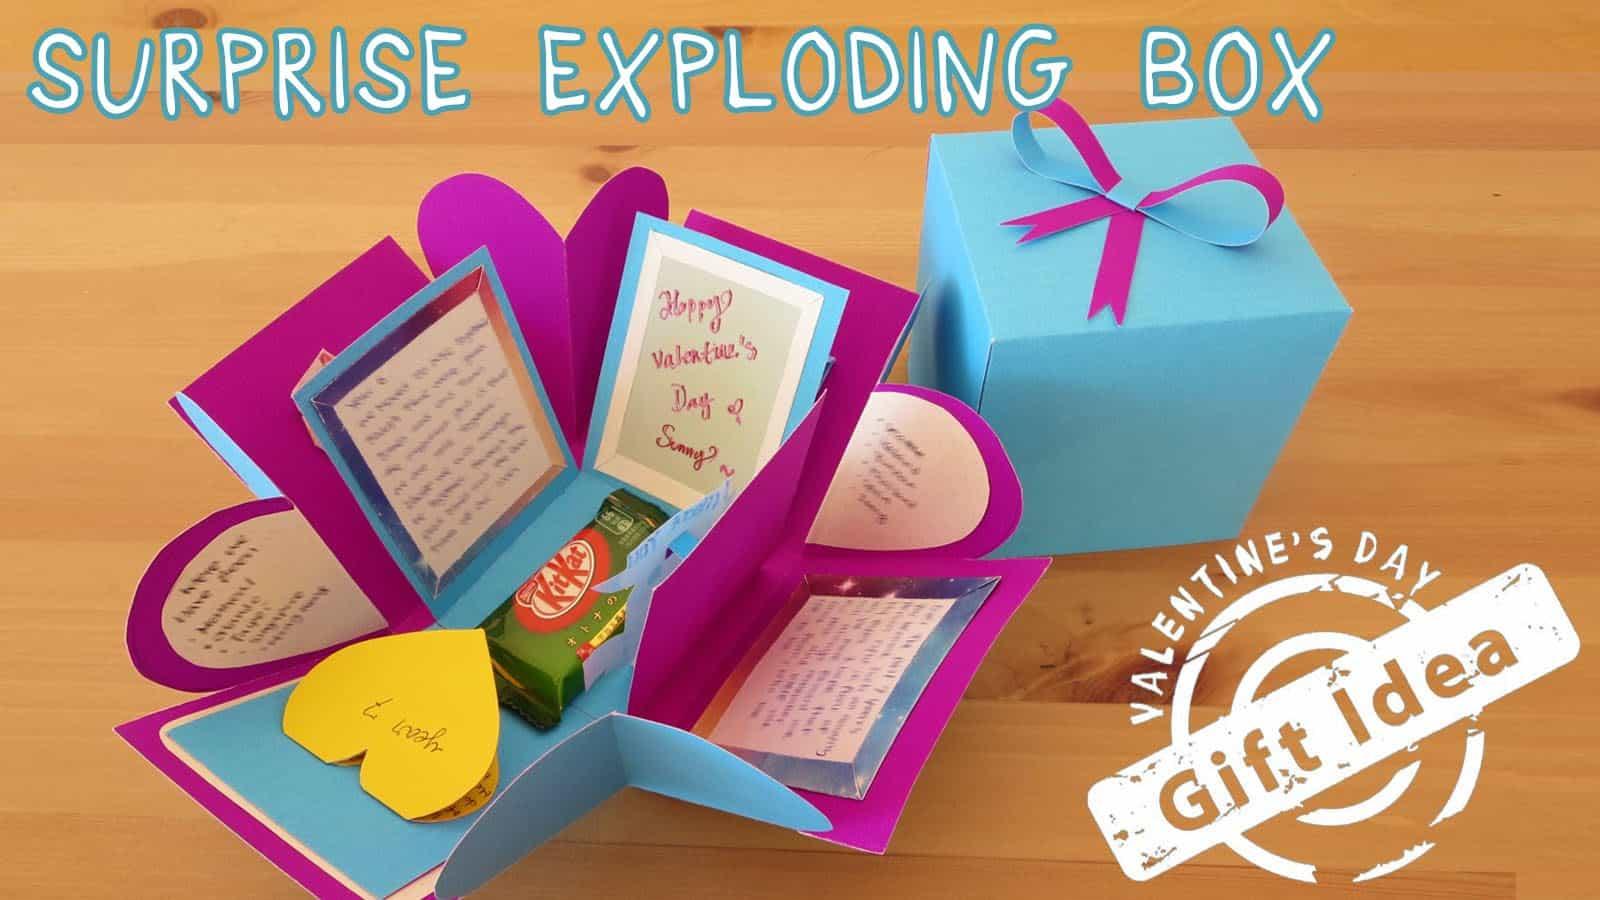 Suprise exploding box